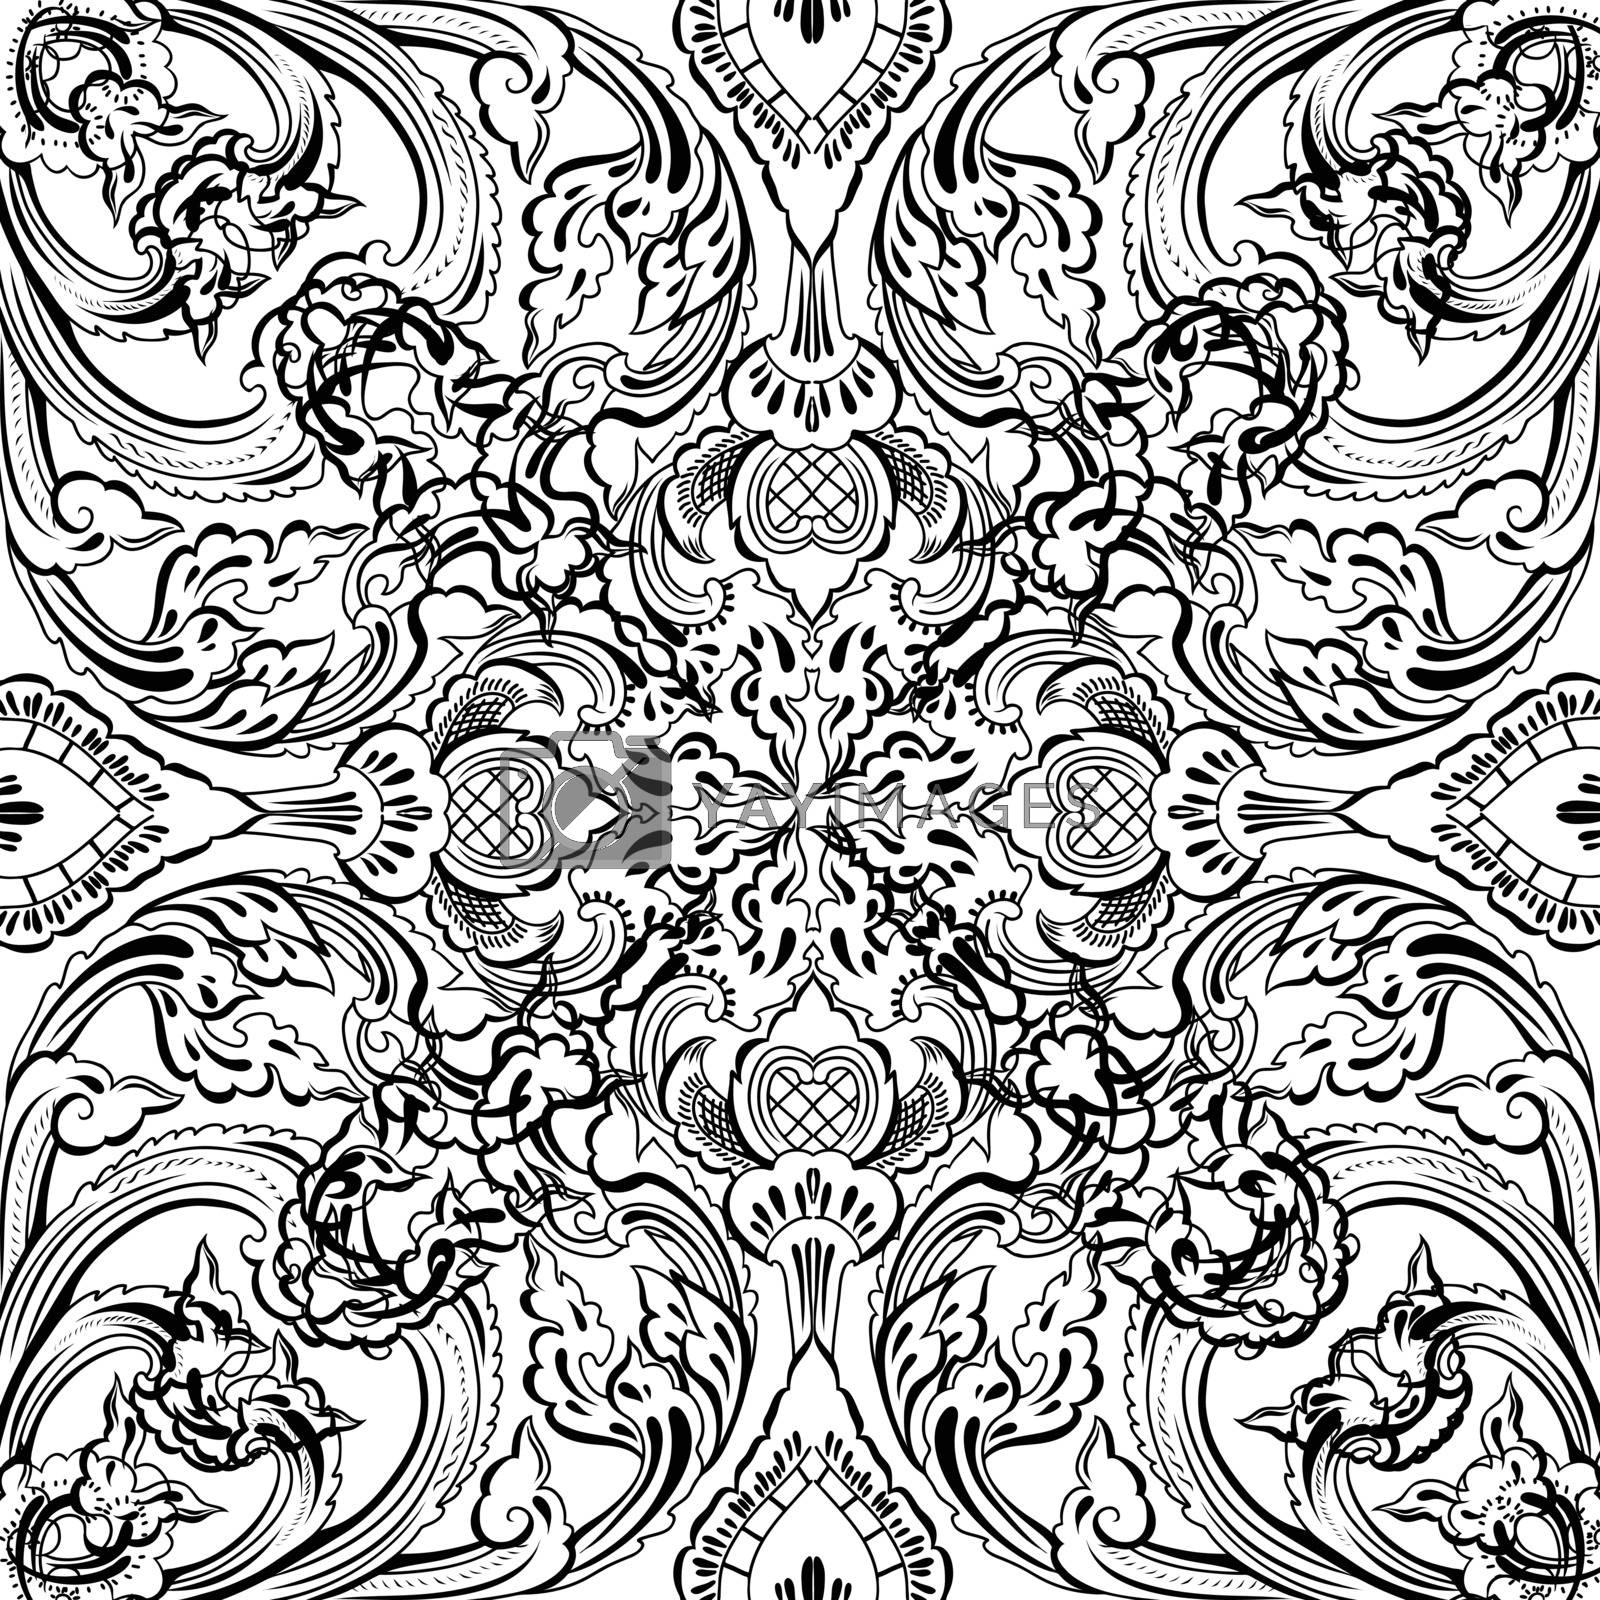 Vector thai floral decorative ornament. EPS illustration